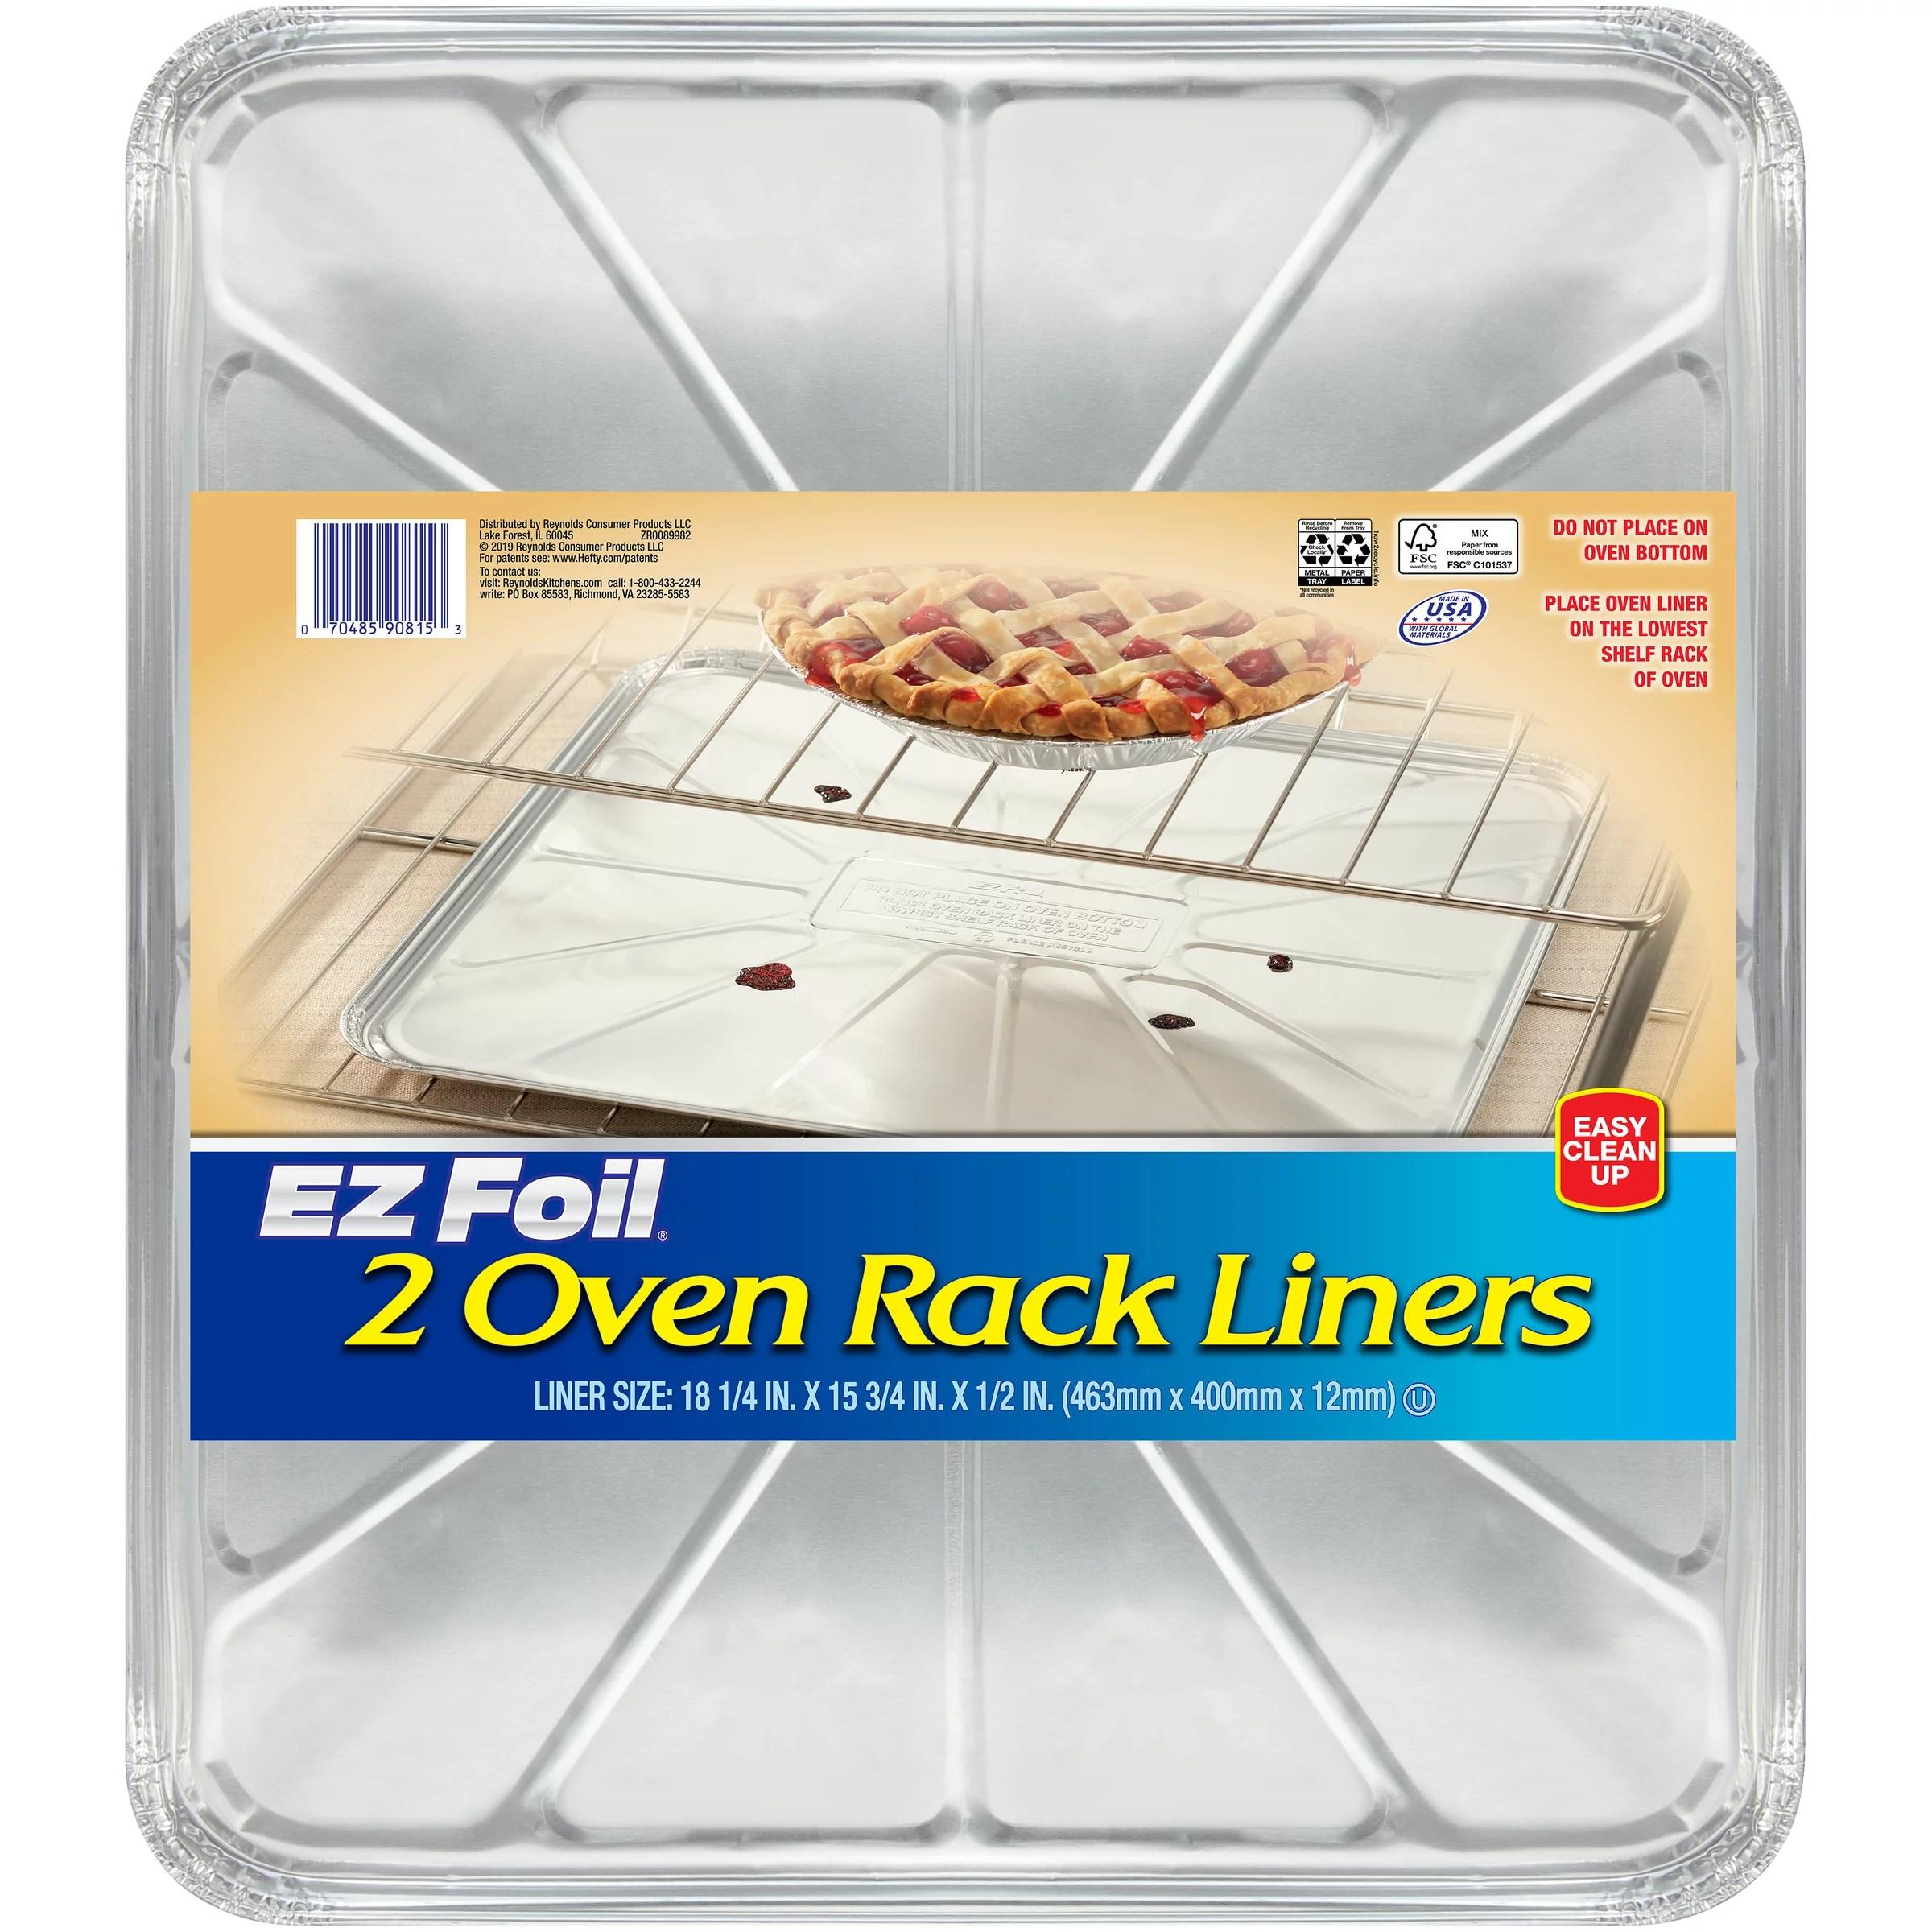 ez foil oven rack liner tray 18 1 4 x 15 3 4 x 1 2 inches 2 count walmart com